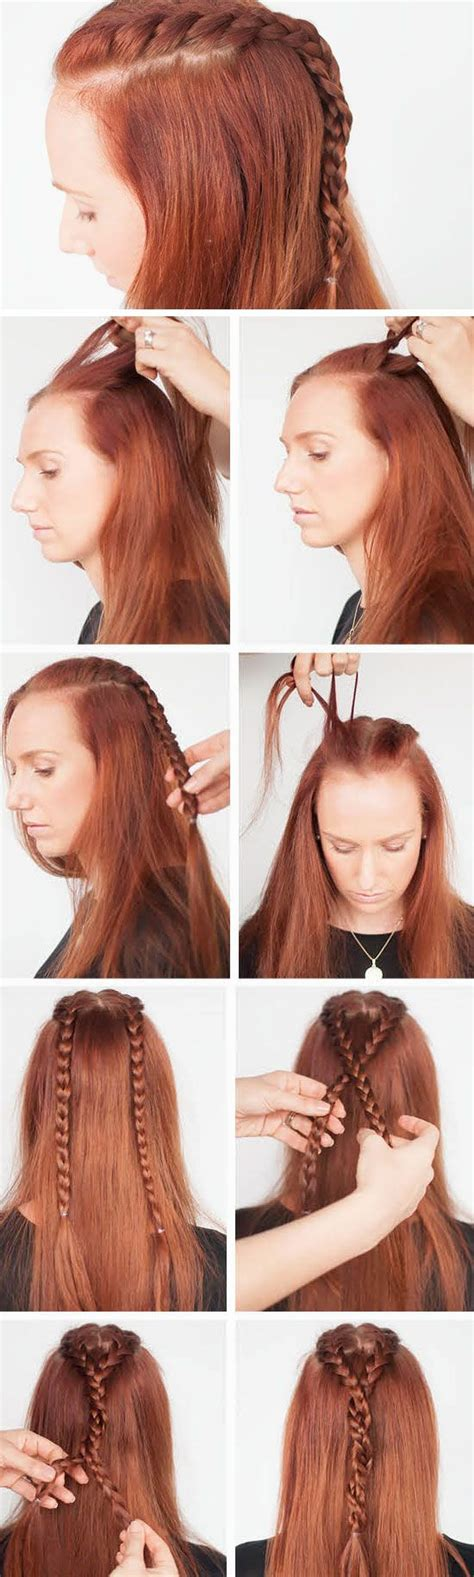 diy renaissance hairstyles victorian era hairstyles instructions hair